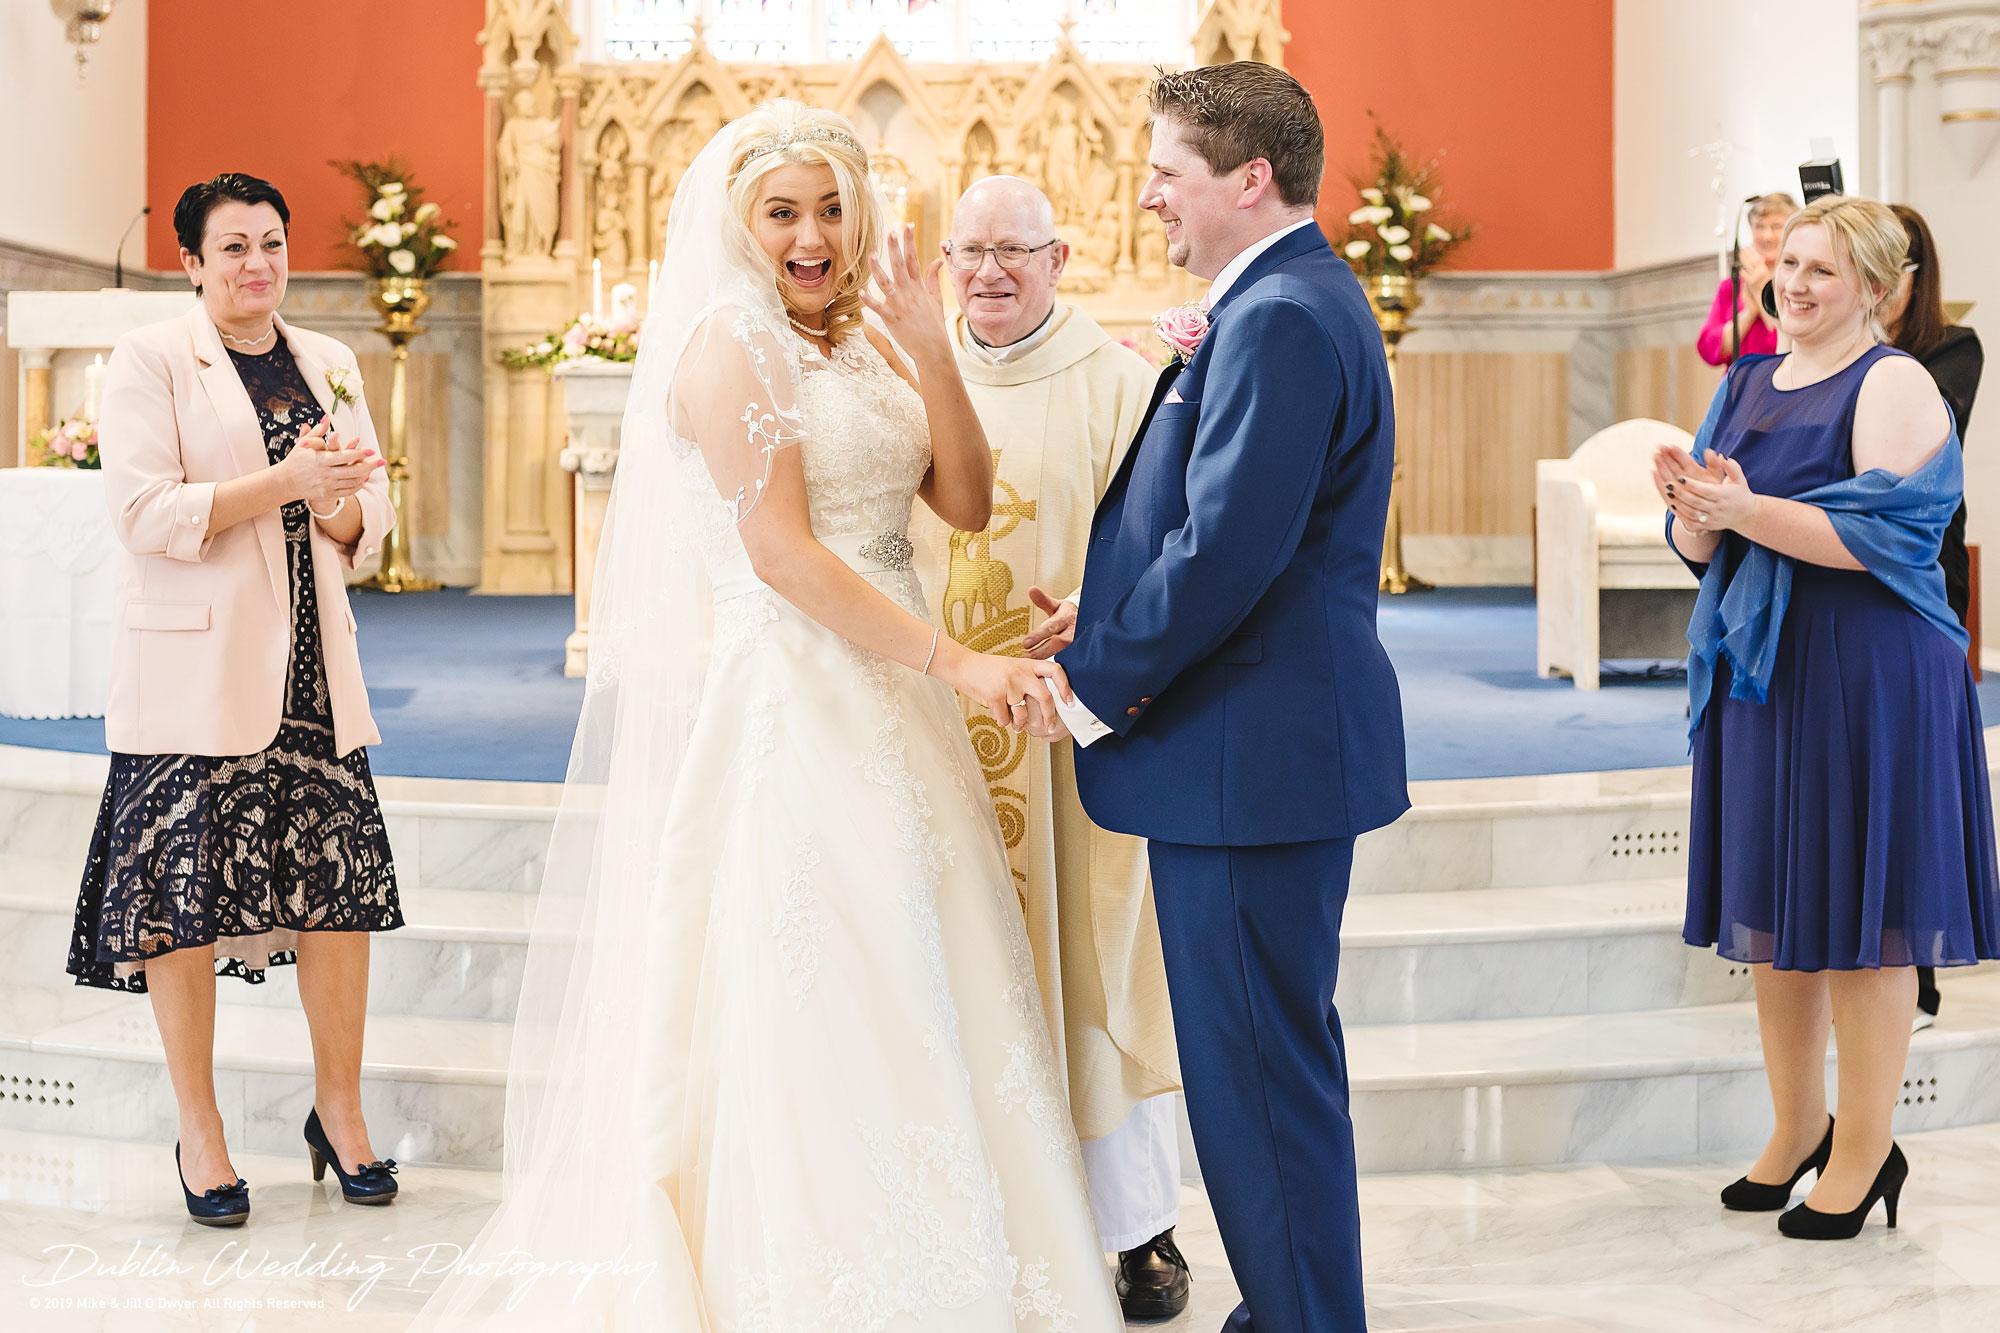 wedding-photographer-wicklow-glenview-hotel-KS024.jpg